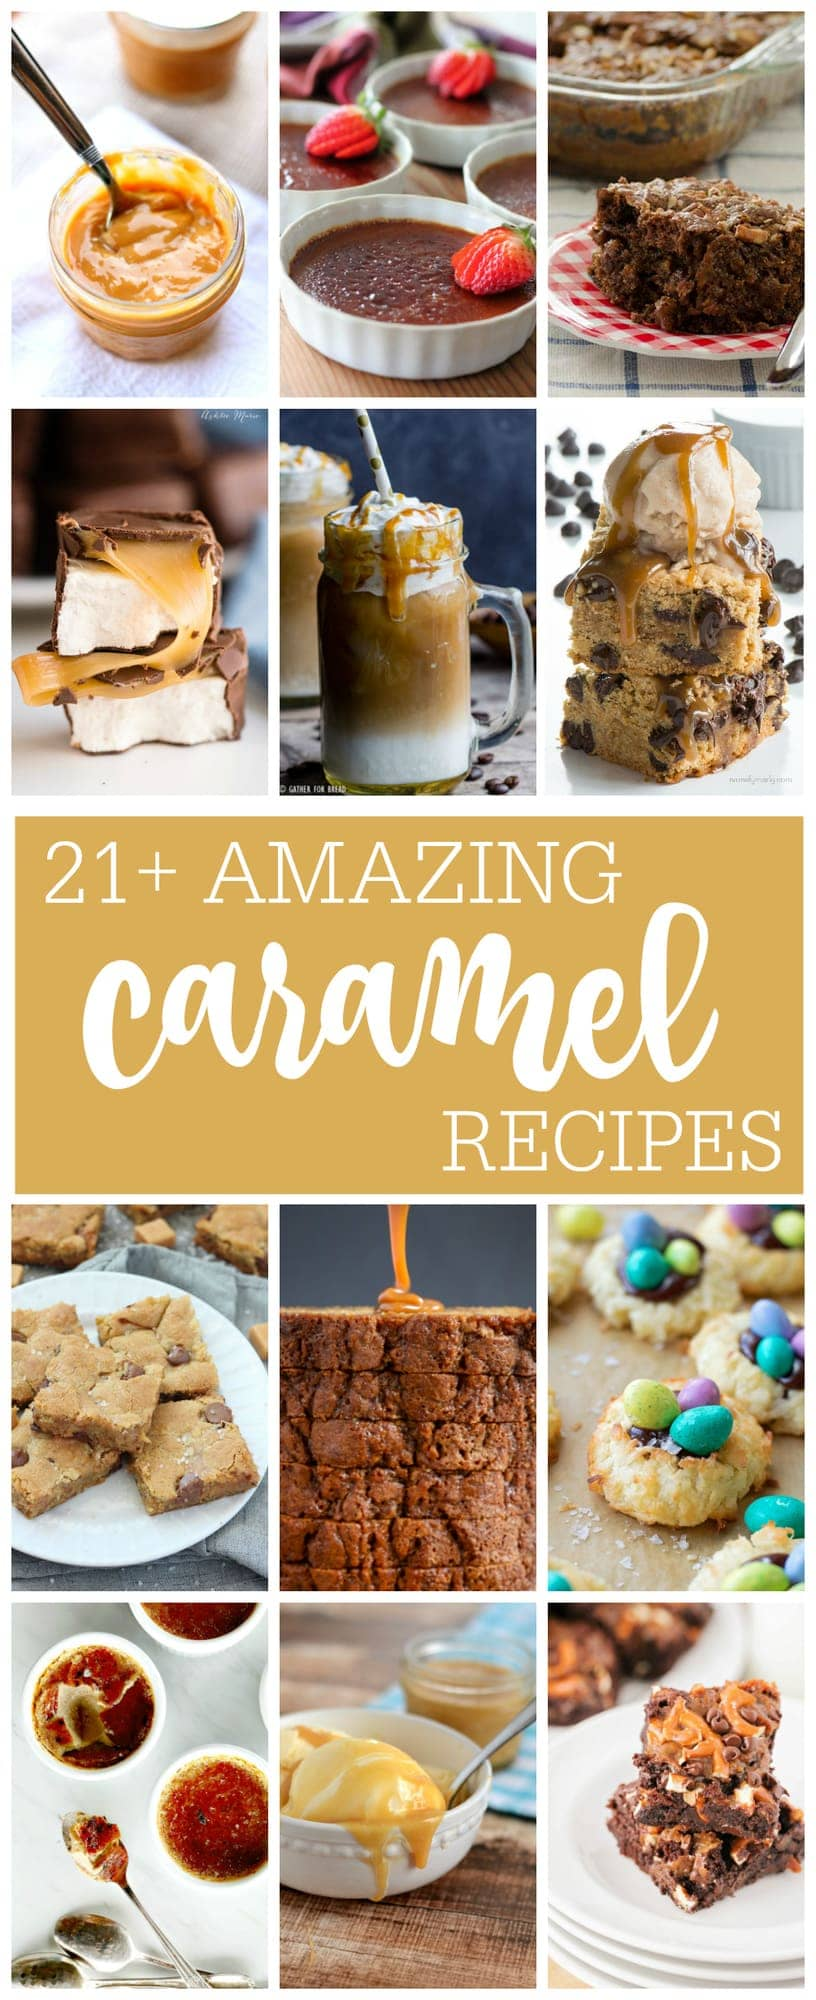 Social media image for 21+ Amazing Caramel Recipes